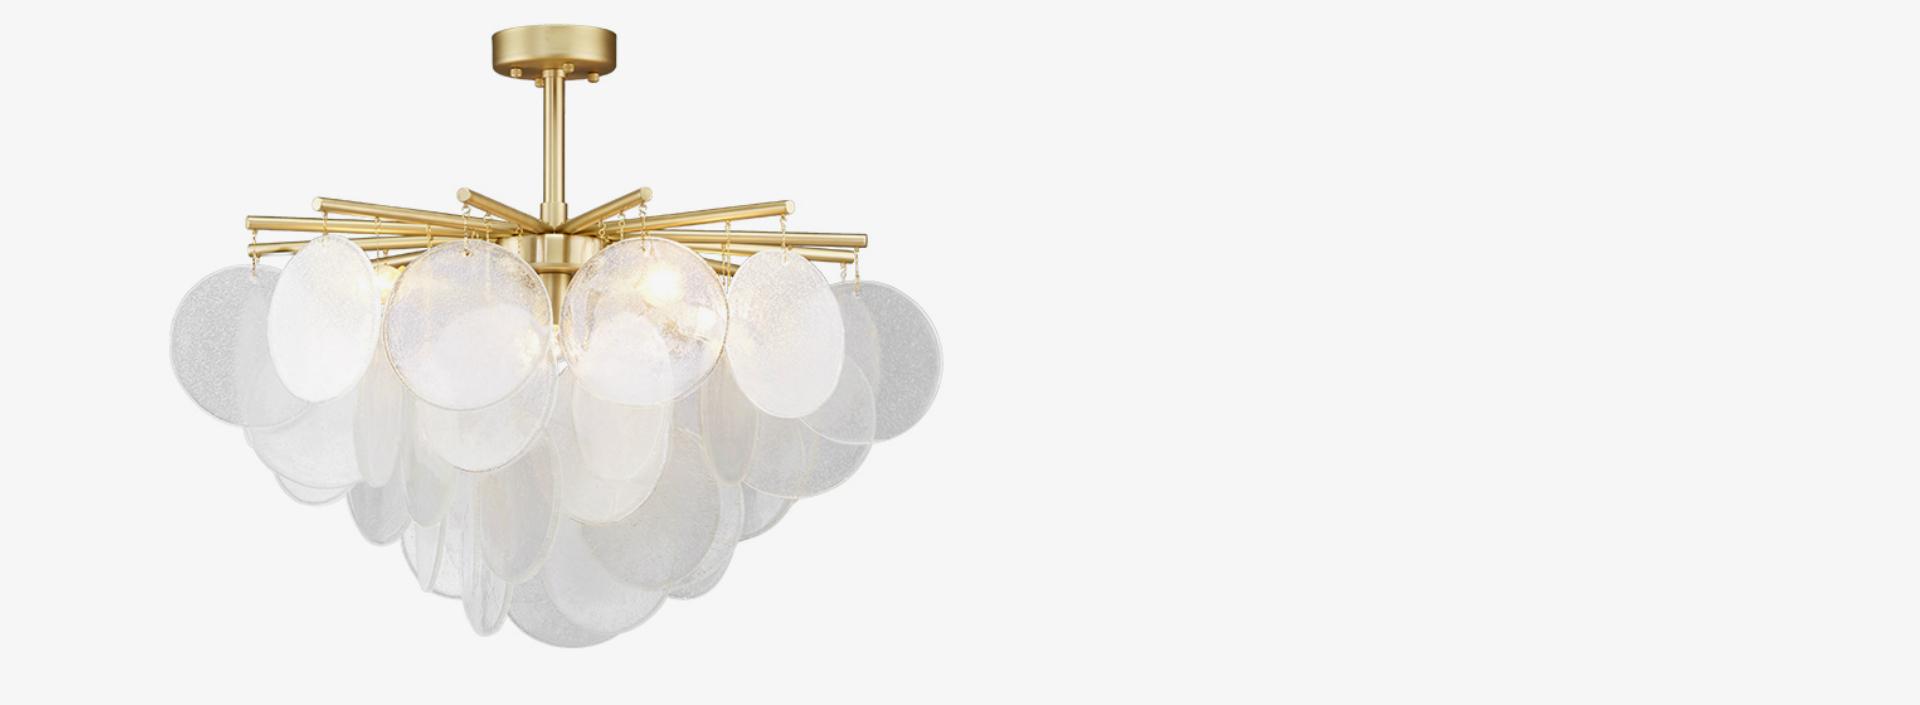 Preferred Lindsey 4 Light Drum Chandeliers In Pendant Lamp (Gallery 19 of 20)